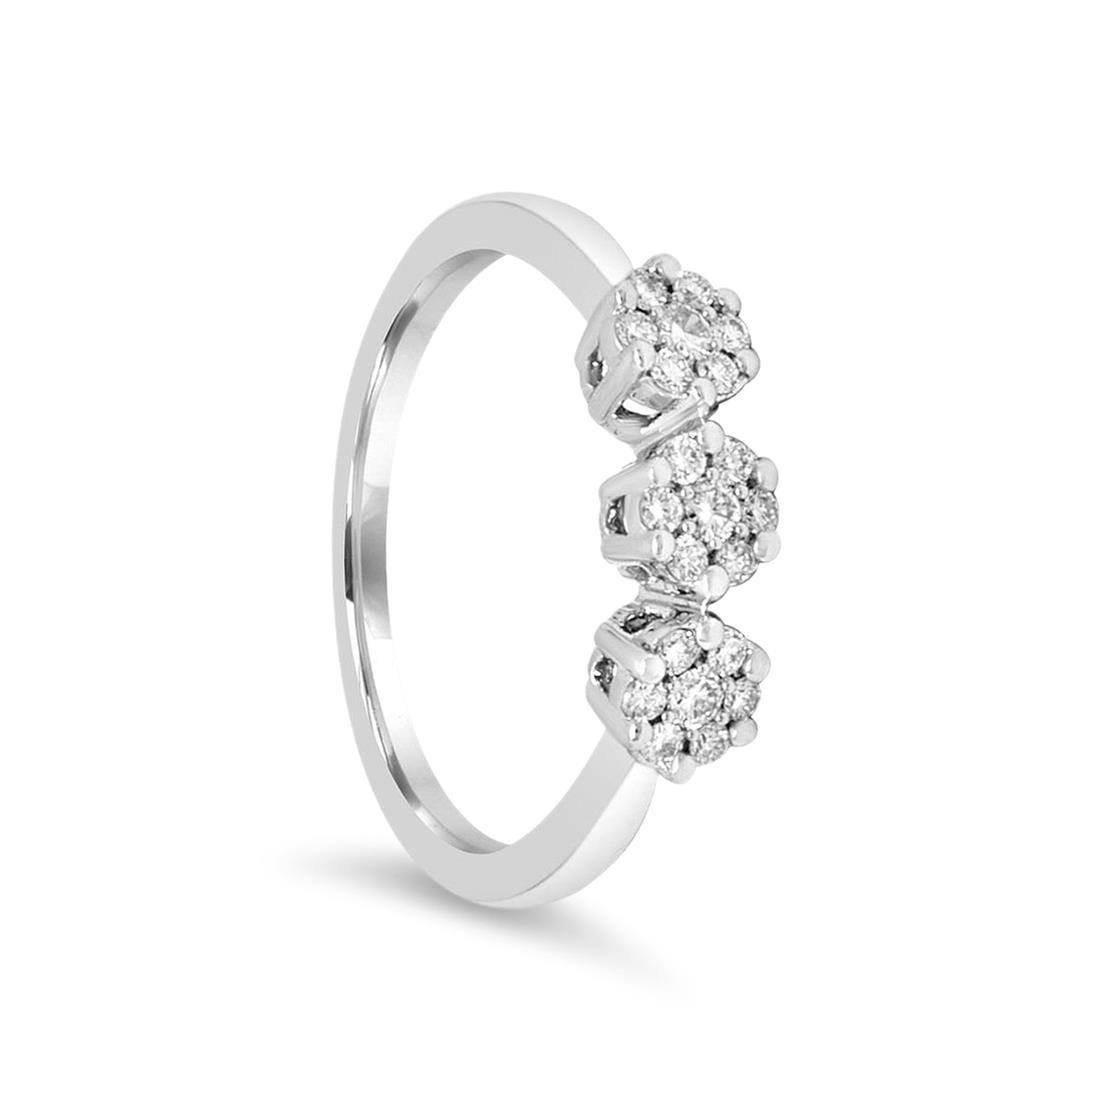 Anillo trilogía con diamantes - ALFIERI & ST. JOHN